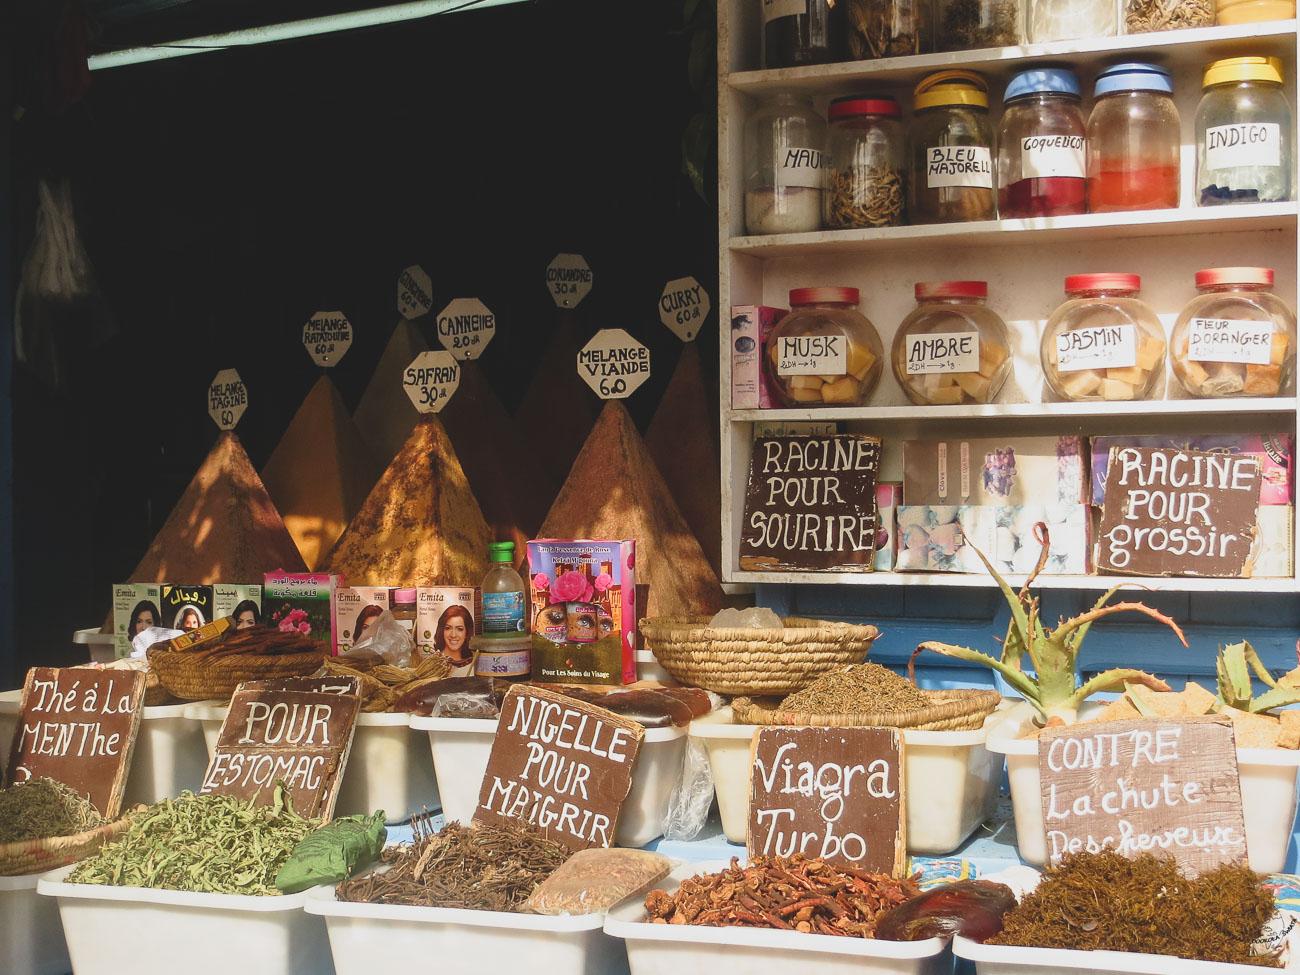 Maroko co warto zjeść